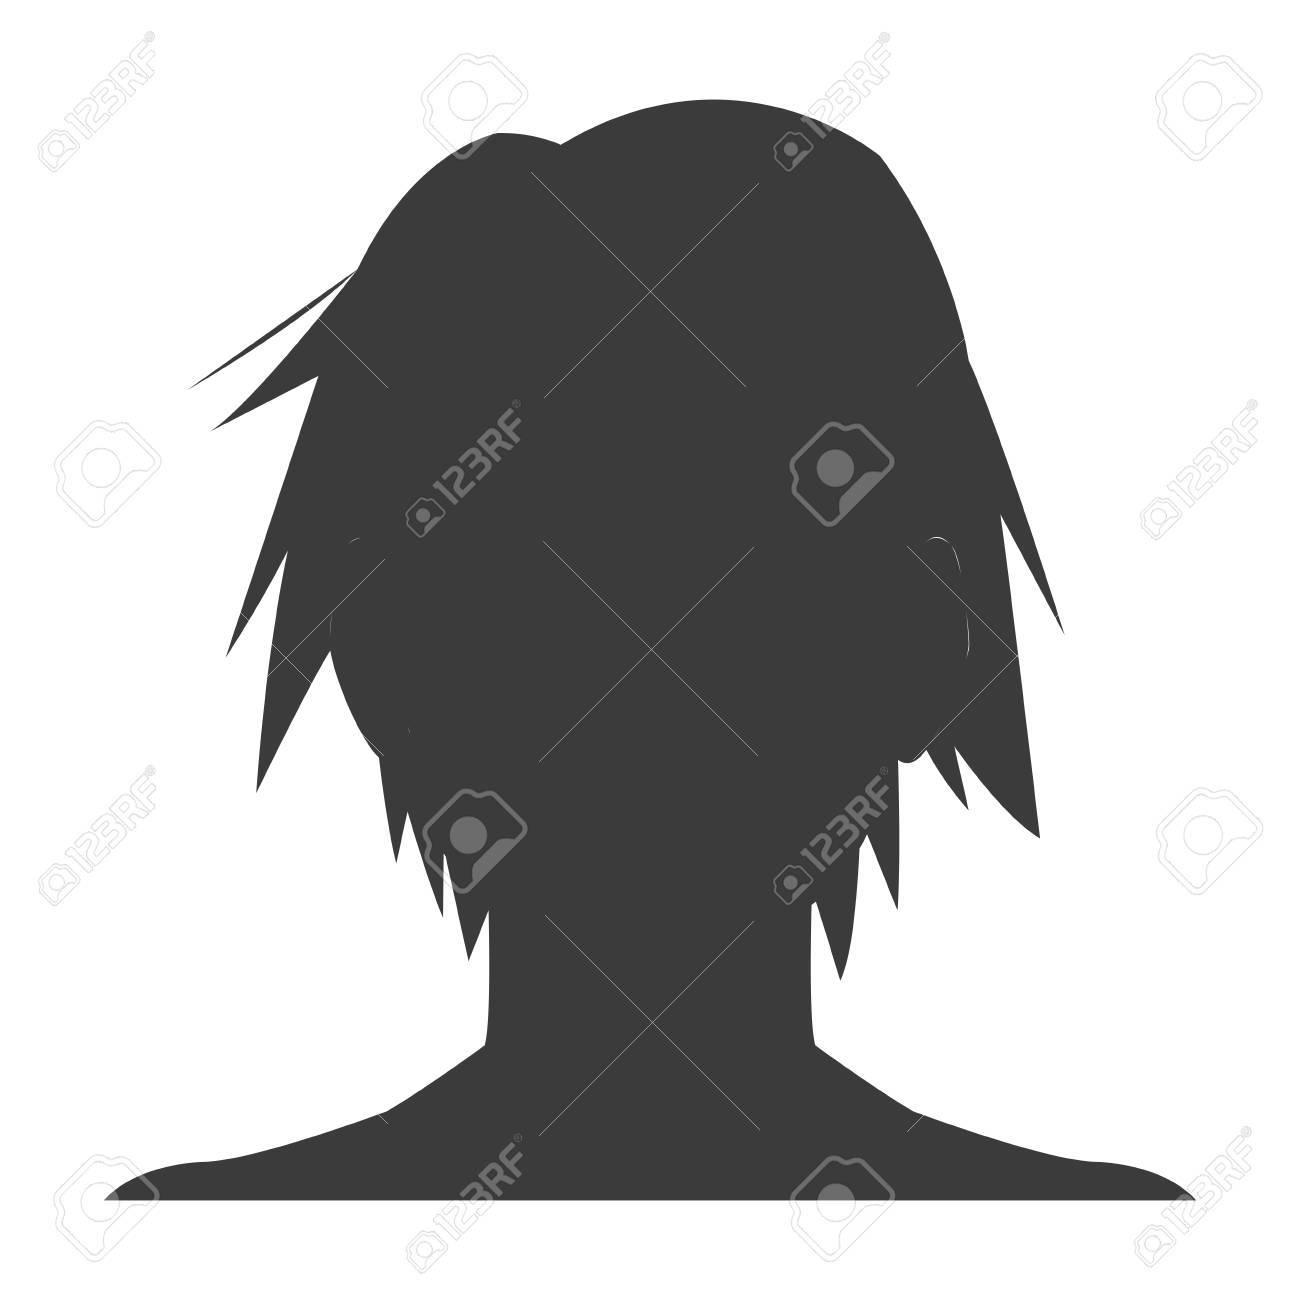 Silhouette head boy anime avatar image vector illustration stock vector 77853621